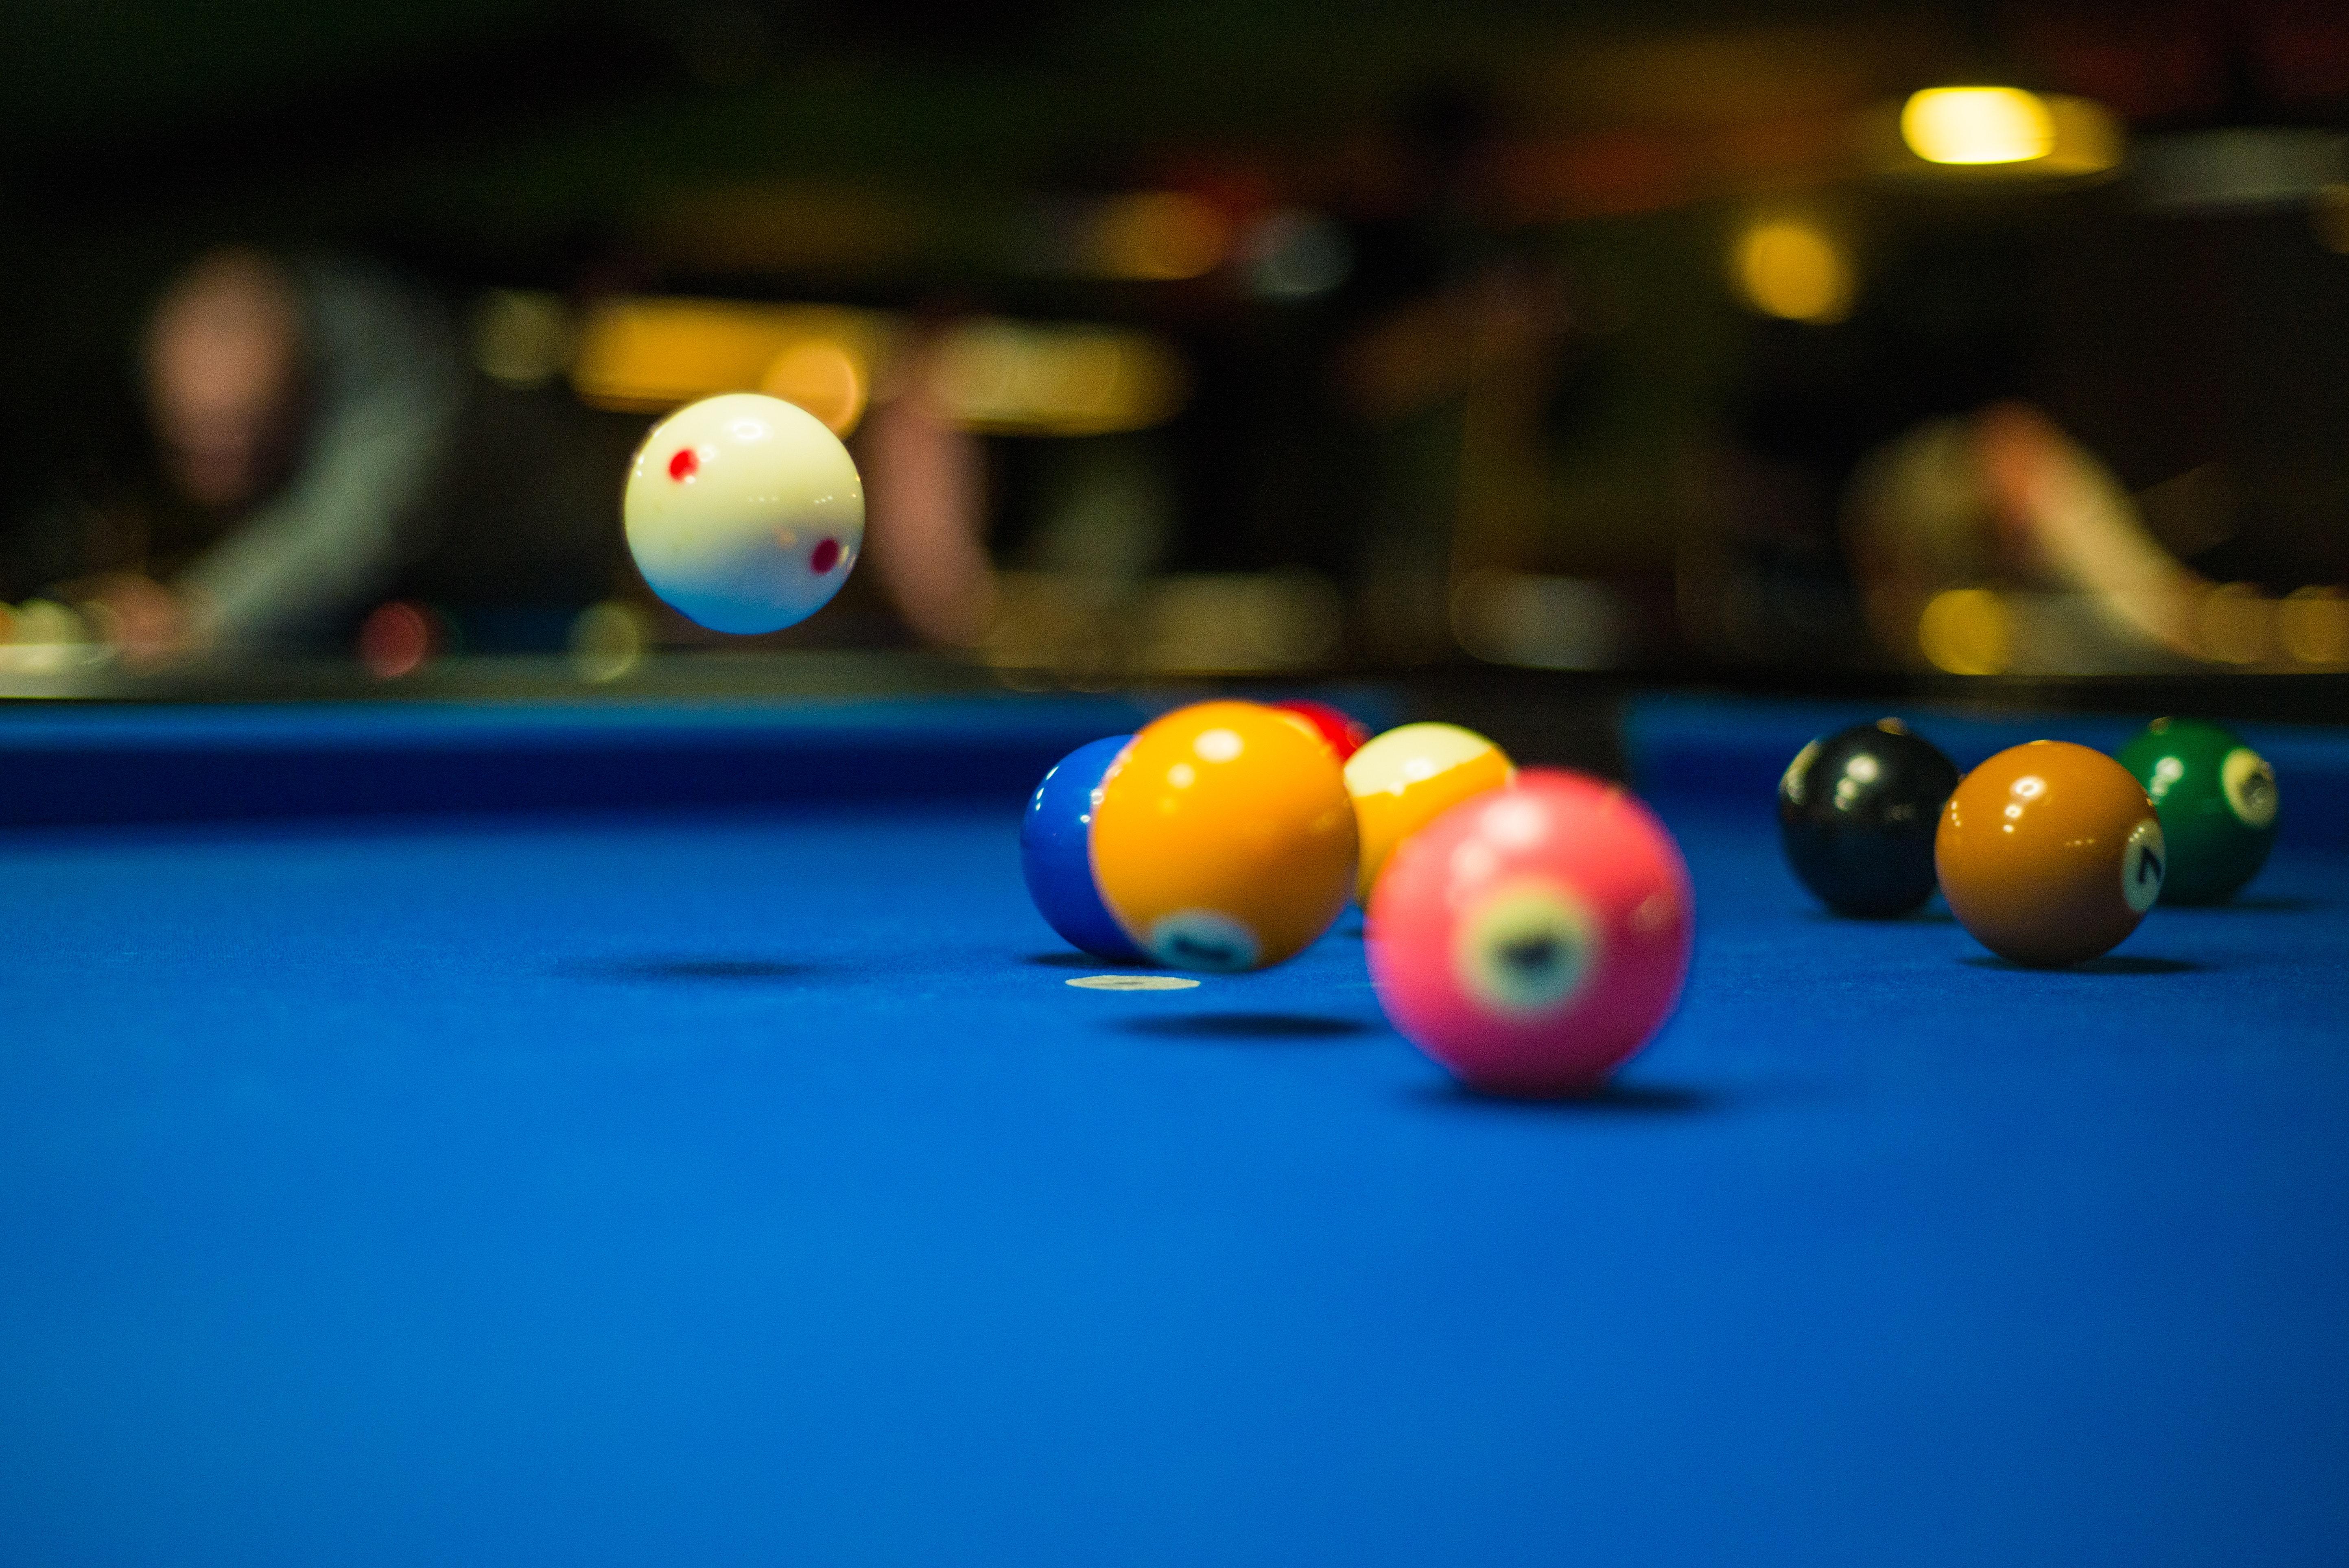 how to play 9 ball on 8 ball pool